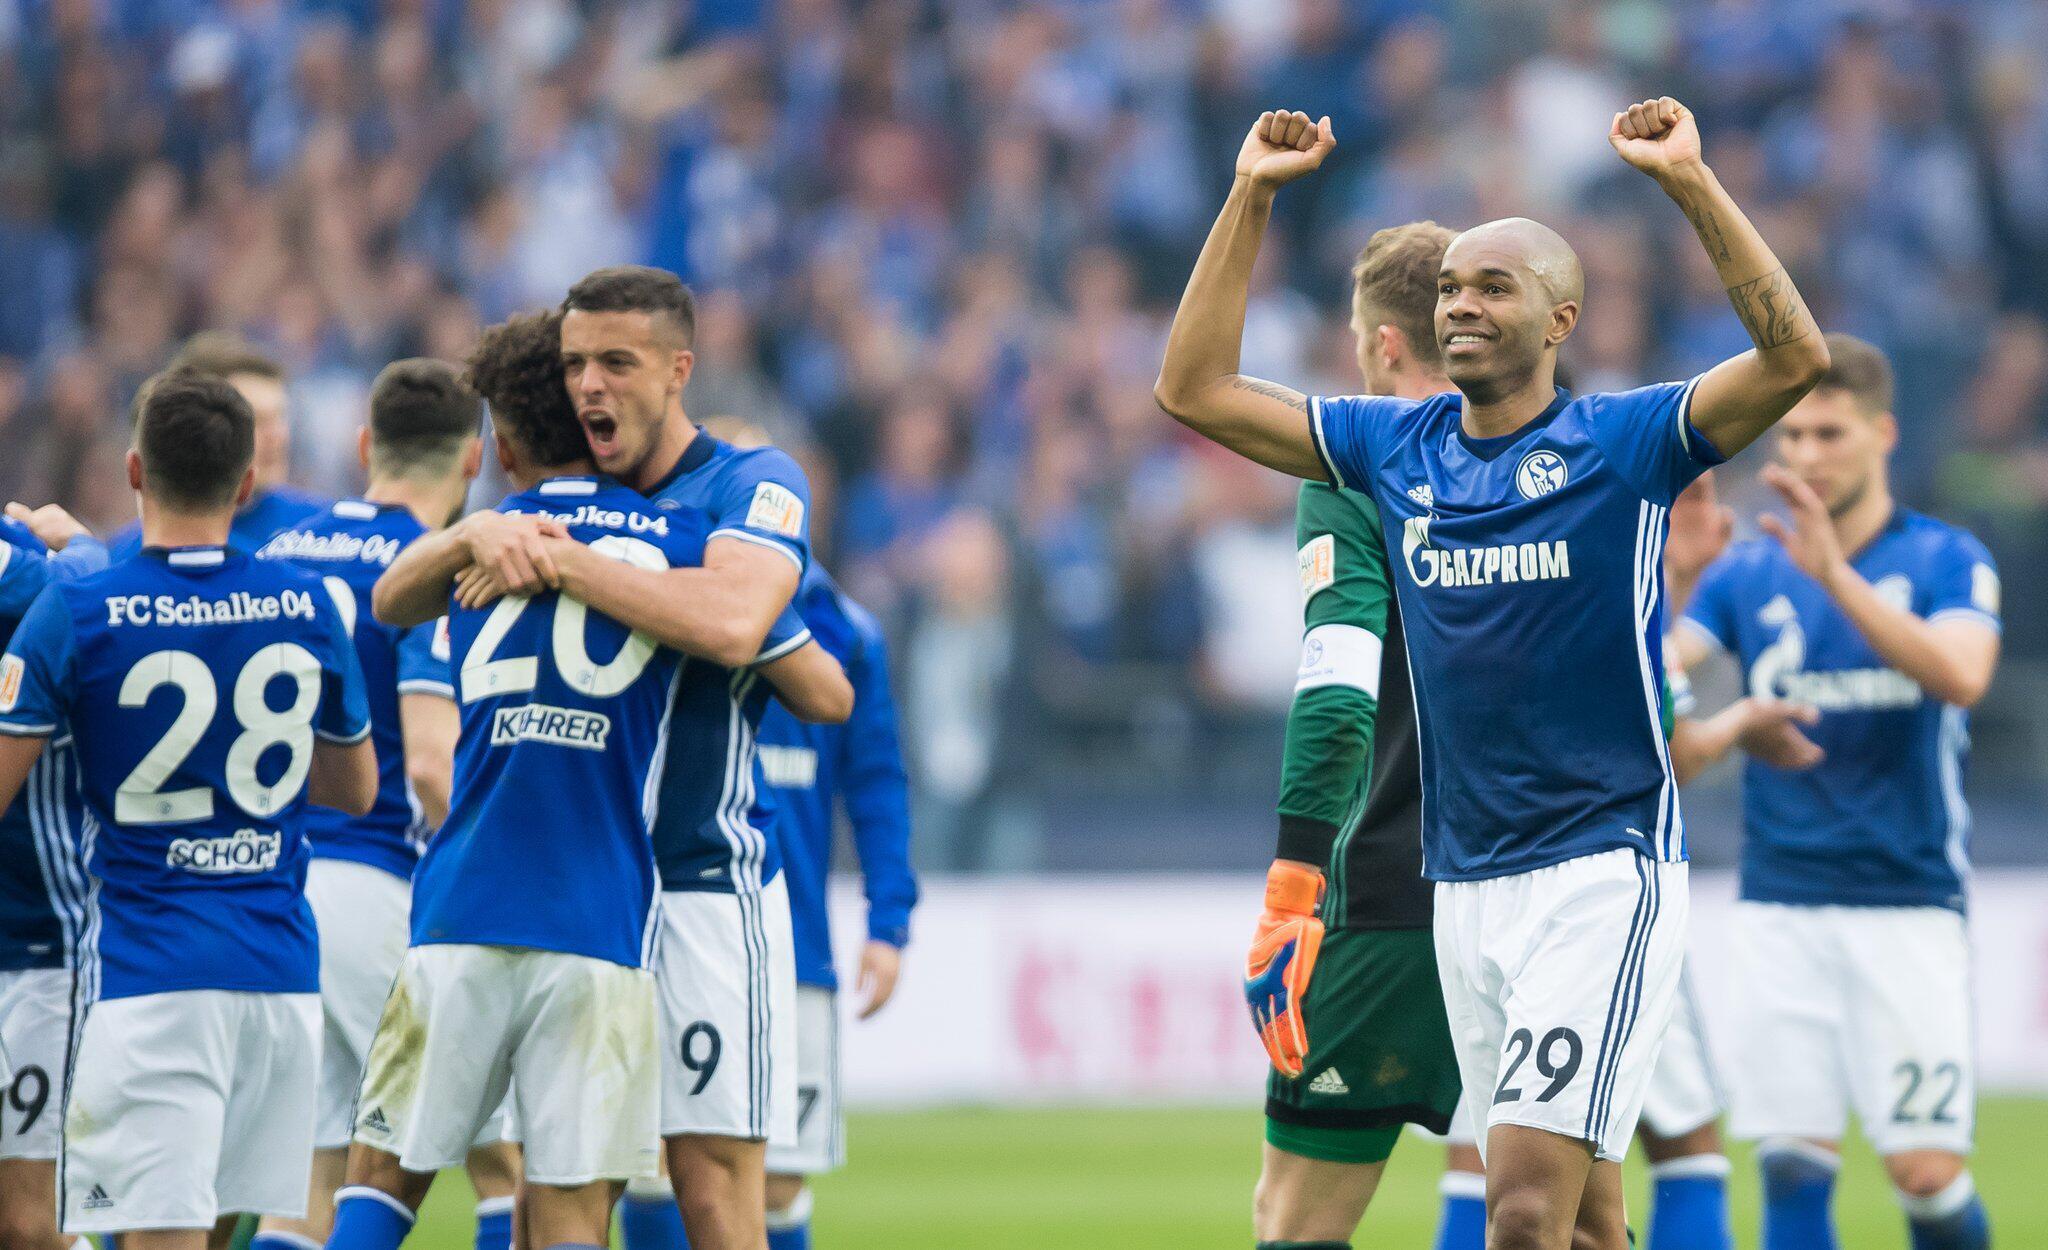 Bild zu FC Schalke 04 vs Borussia Dortmund